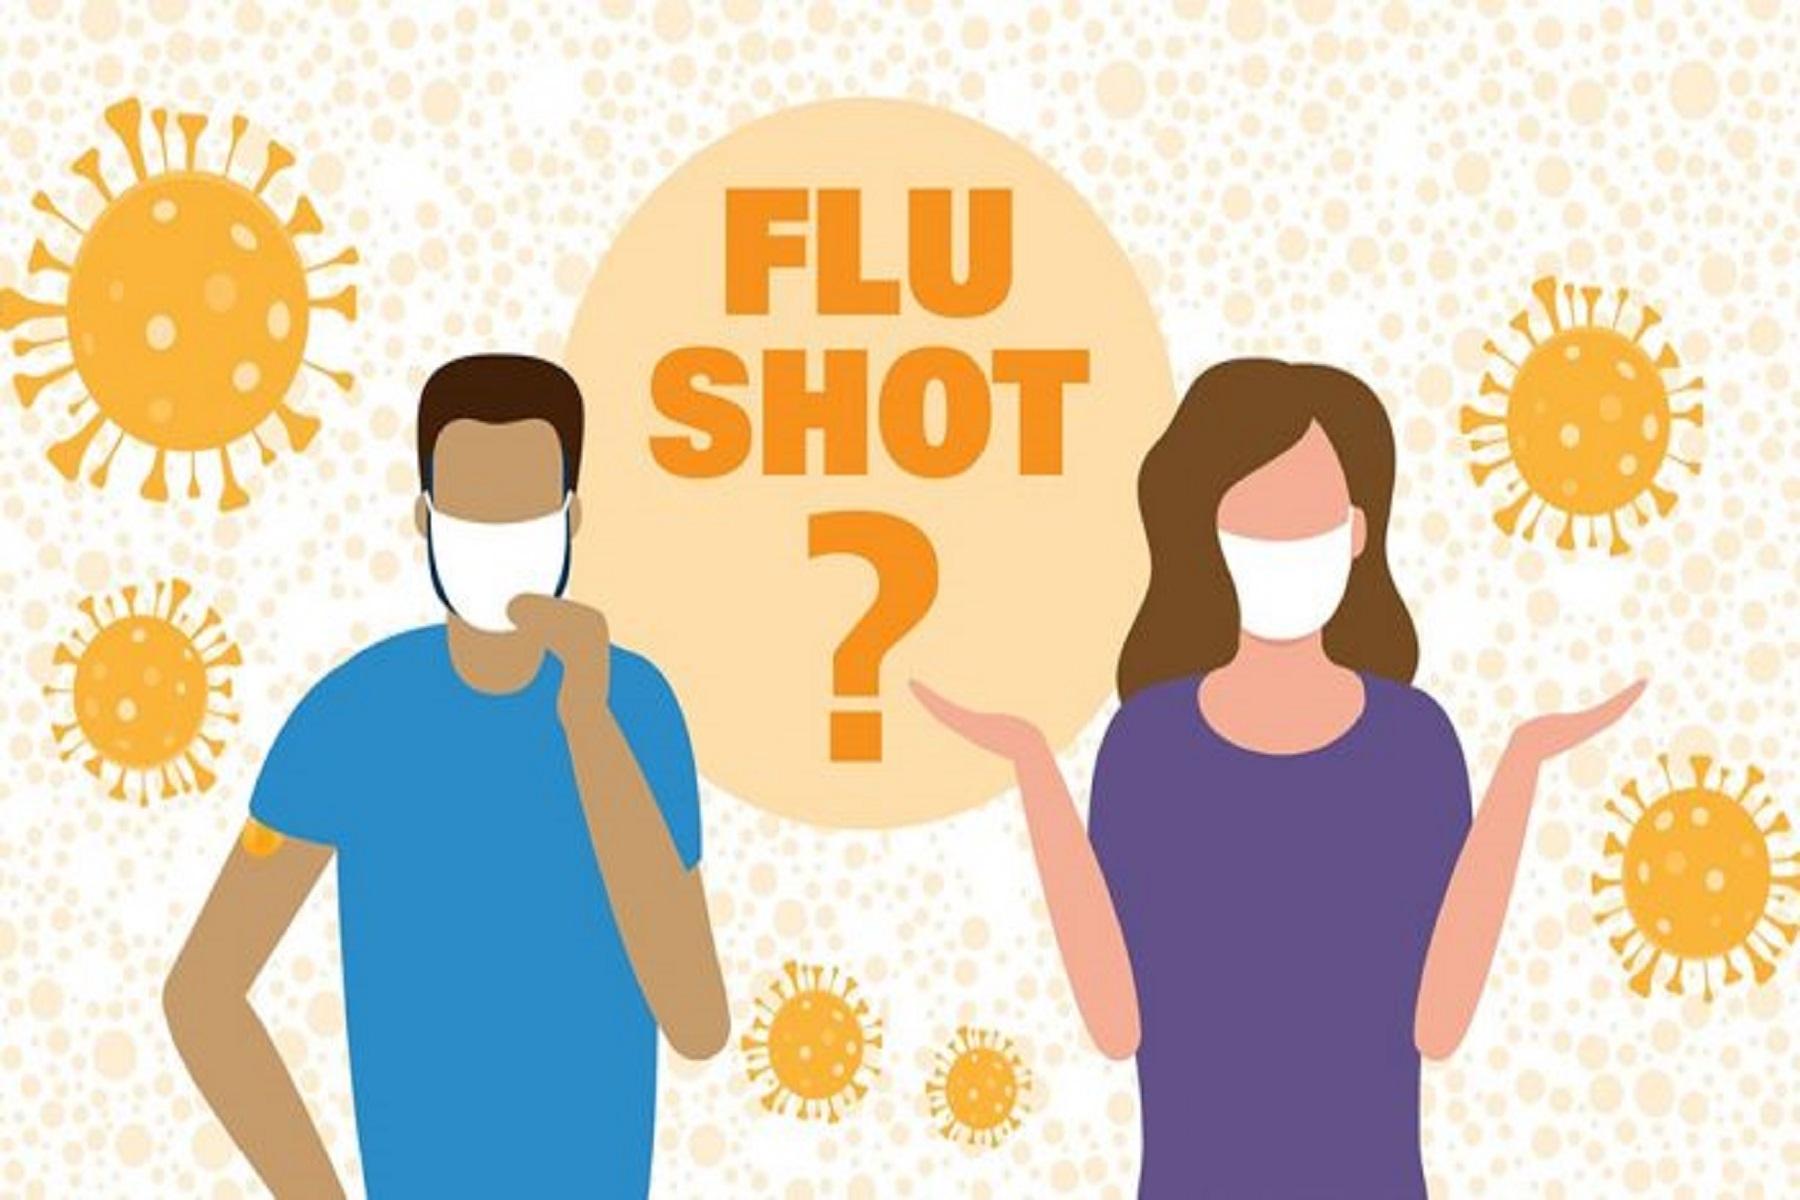 CDC Covid: Το ήπιο κρυολόγημα δεν αποτελεί λόγο για μη εμβολιασμό